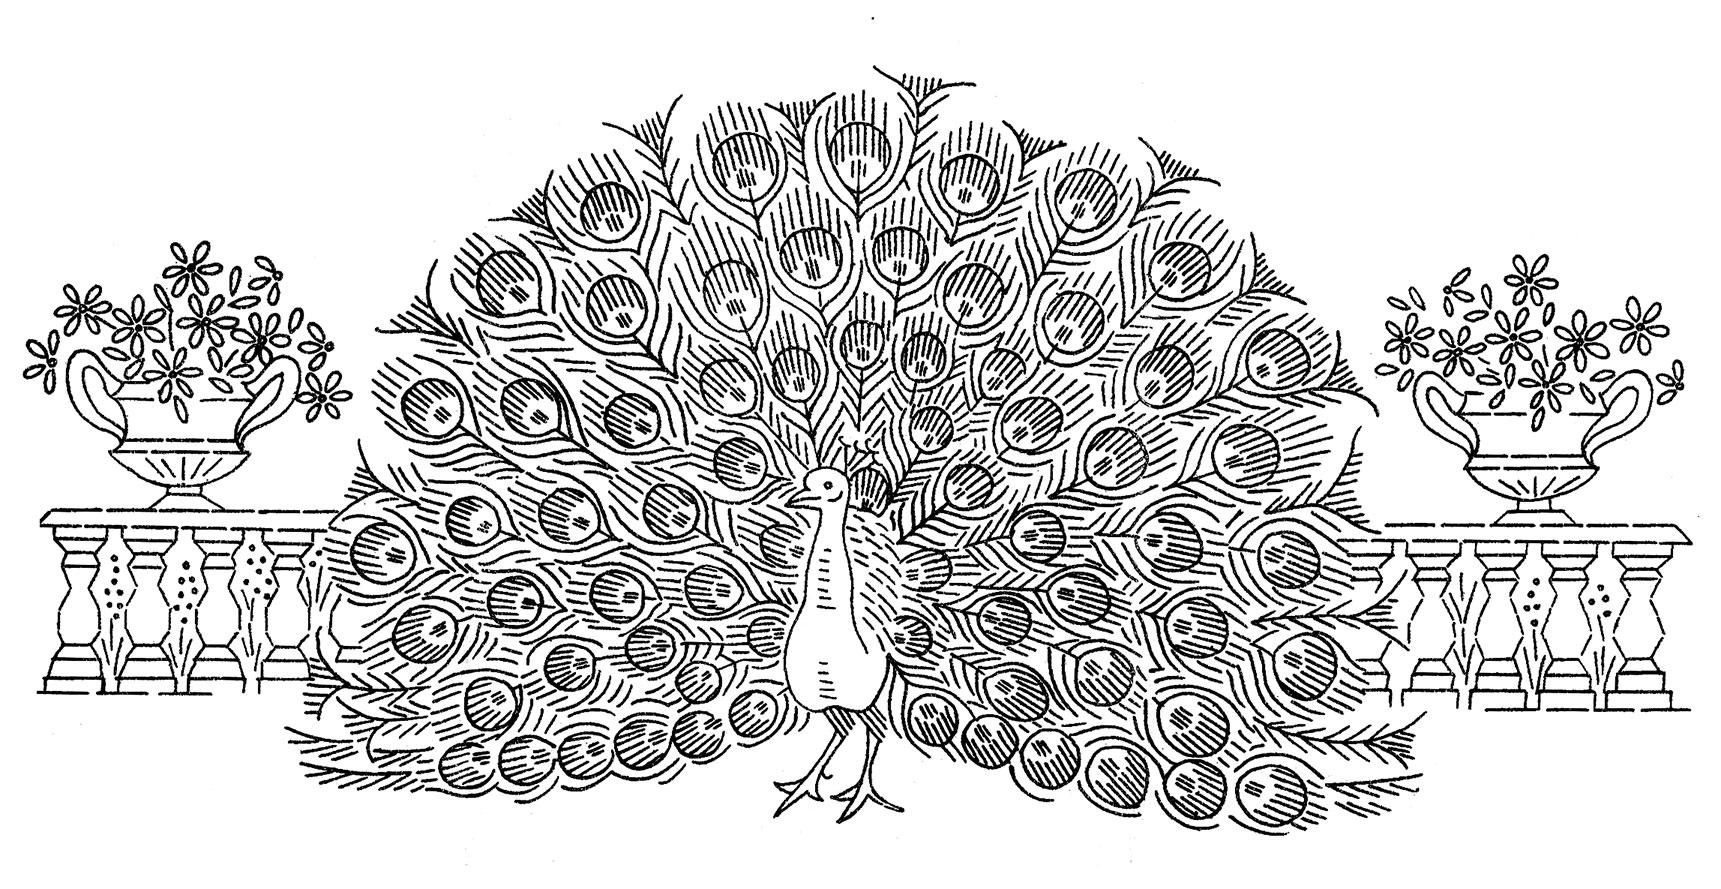 http://qisforquilter.com/wp-content/uploads/Laura-Wheeler-7107-peacocks-2.jpg